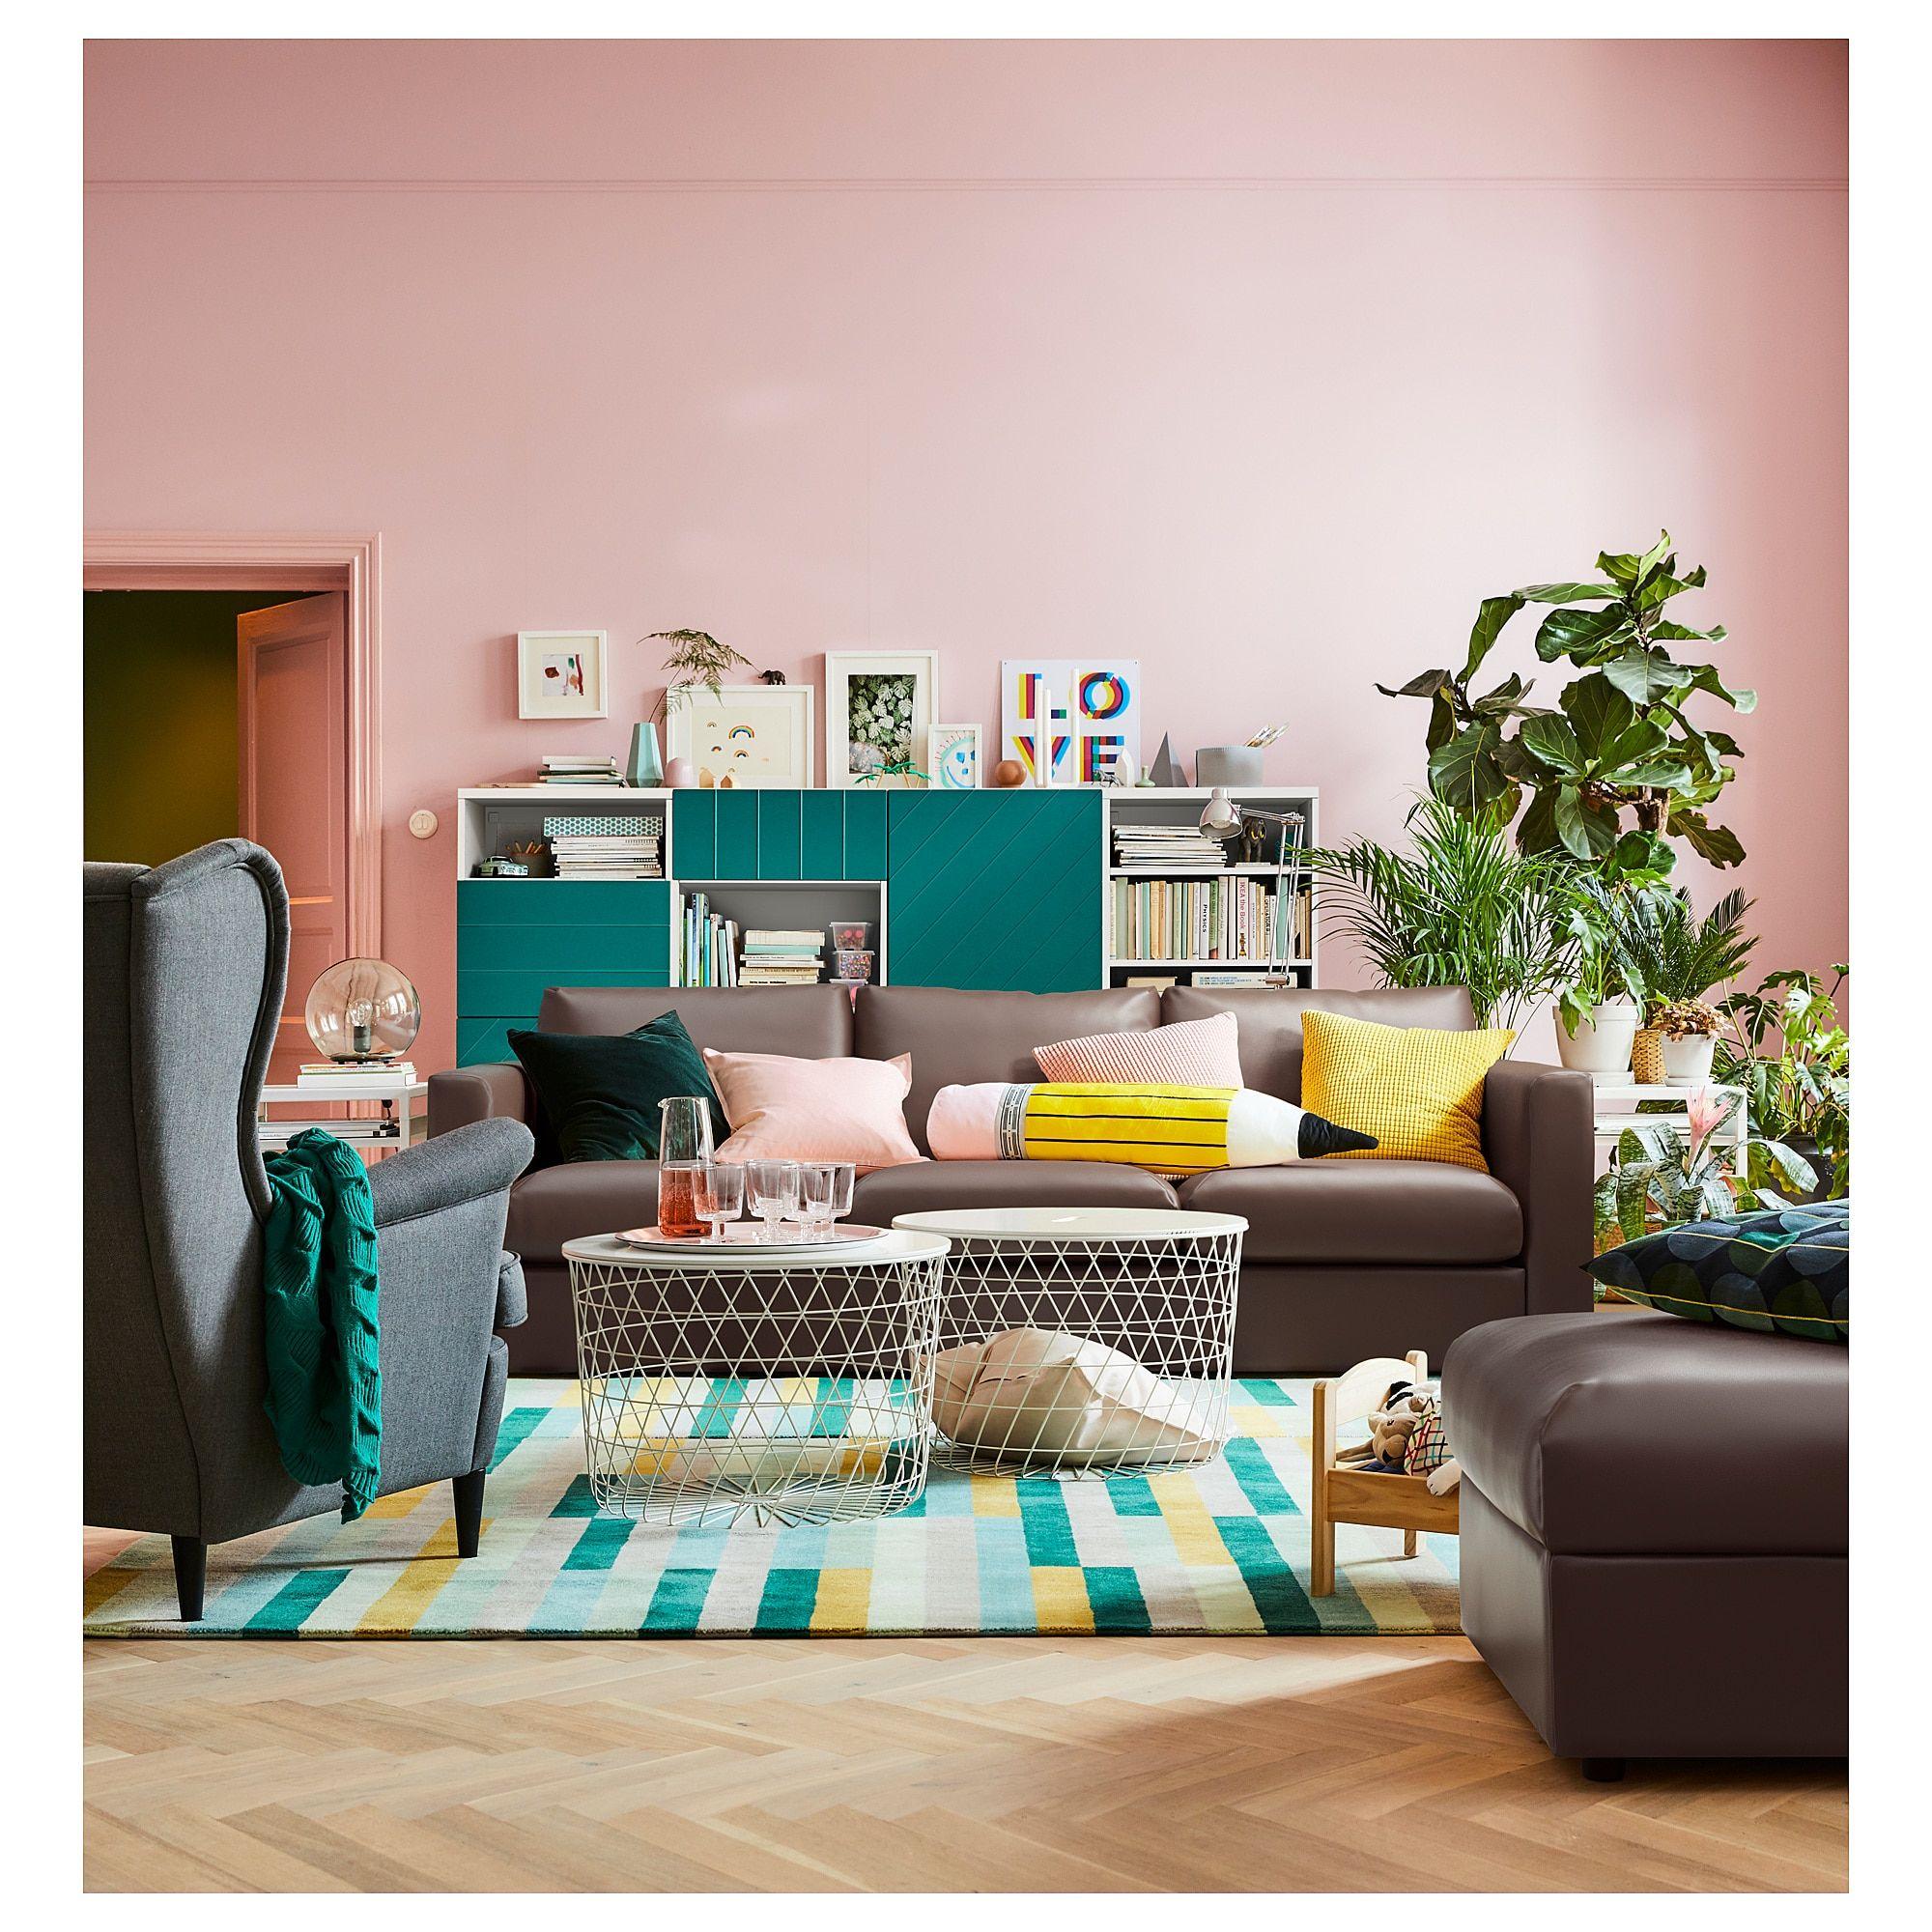 Living Room Furniture Ikea: VIMLE Sofabed - Farsta Dark Brown In 2019